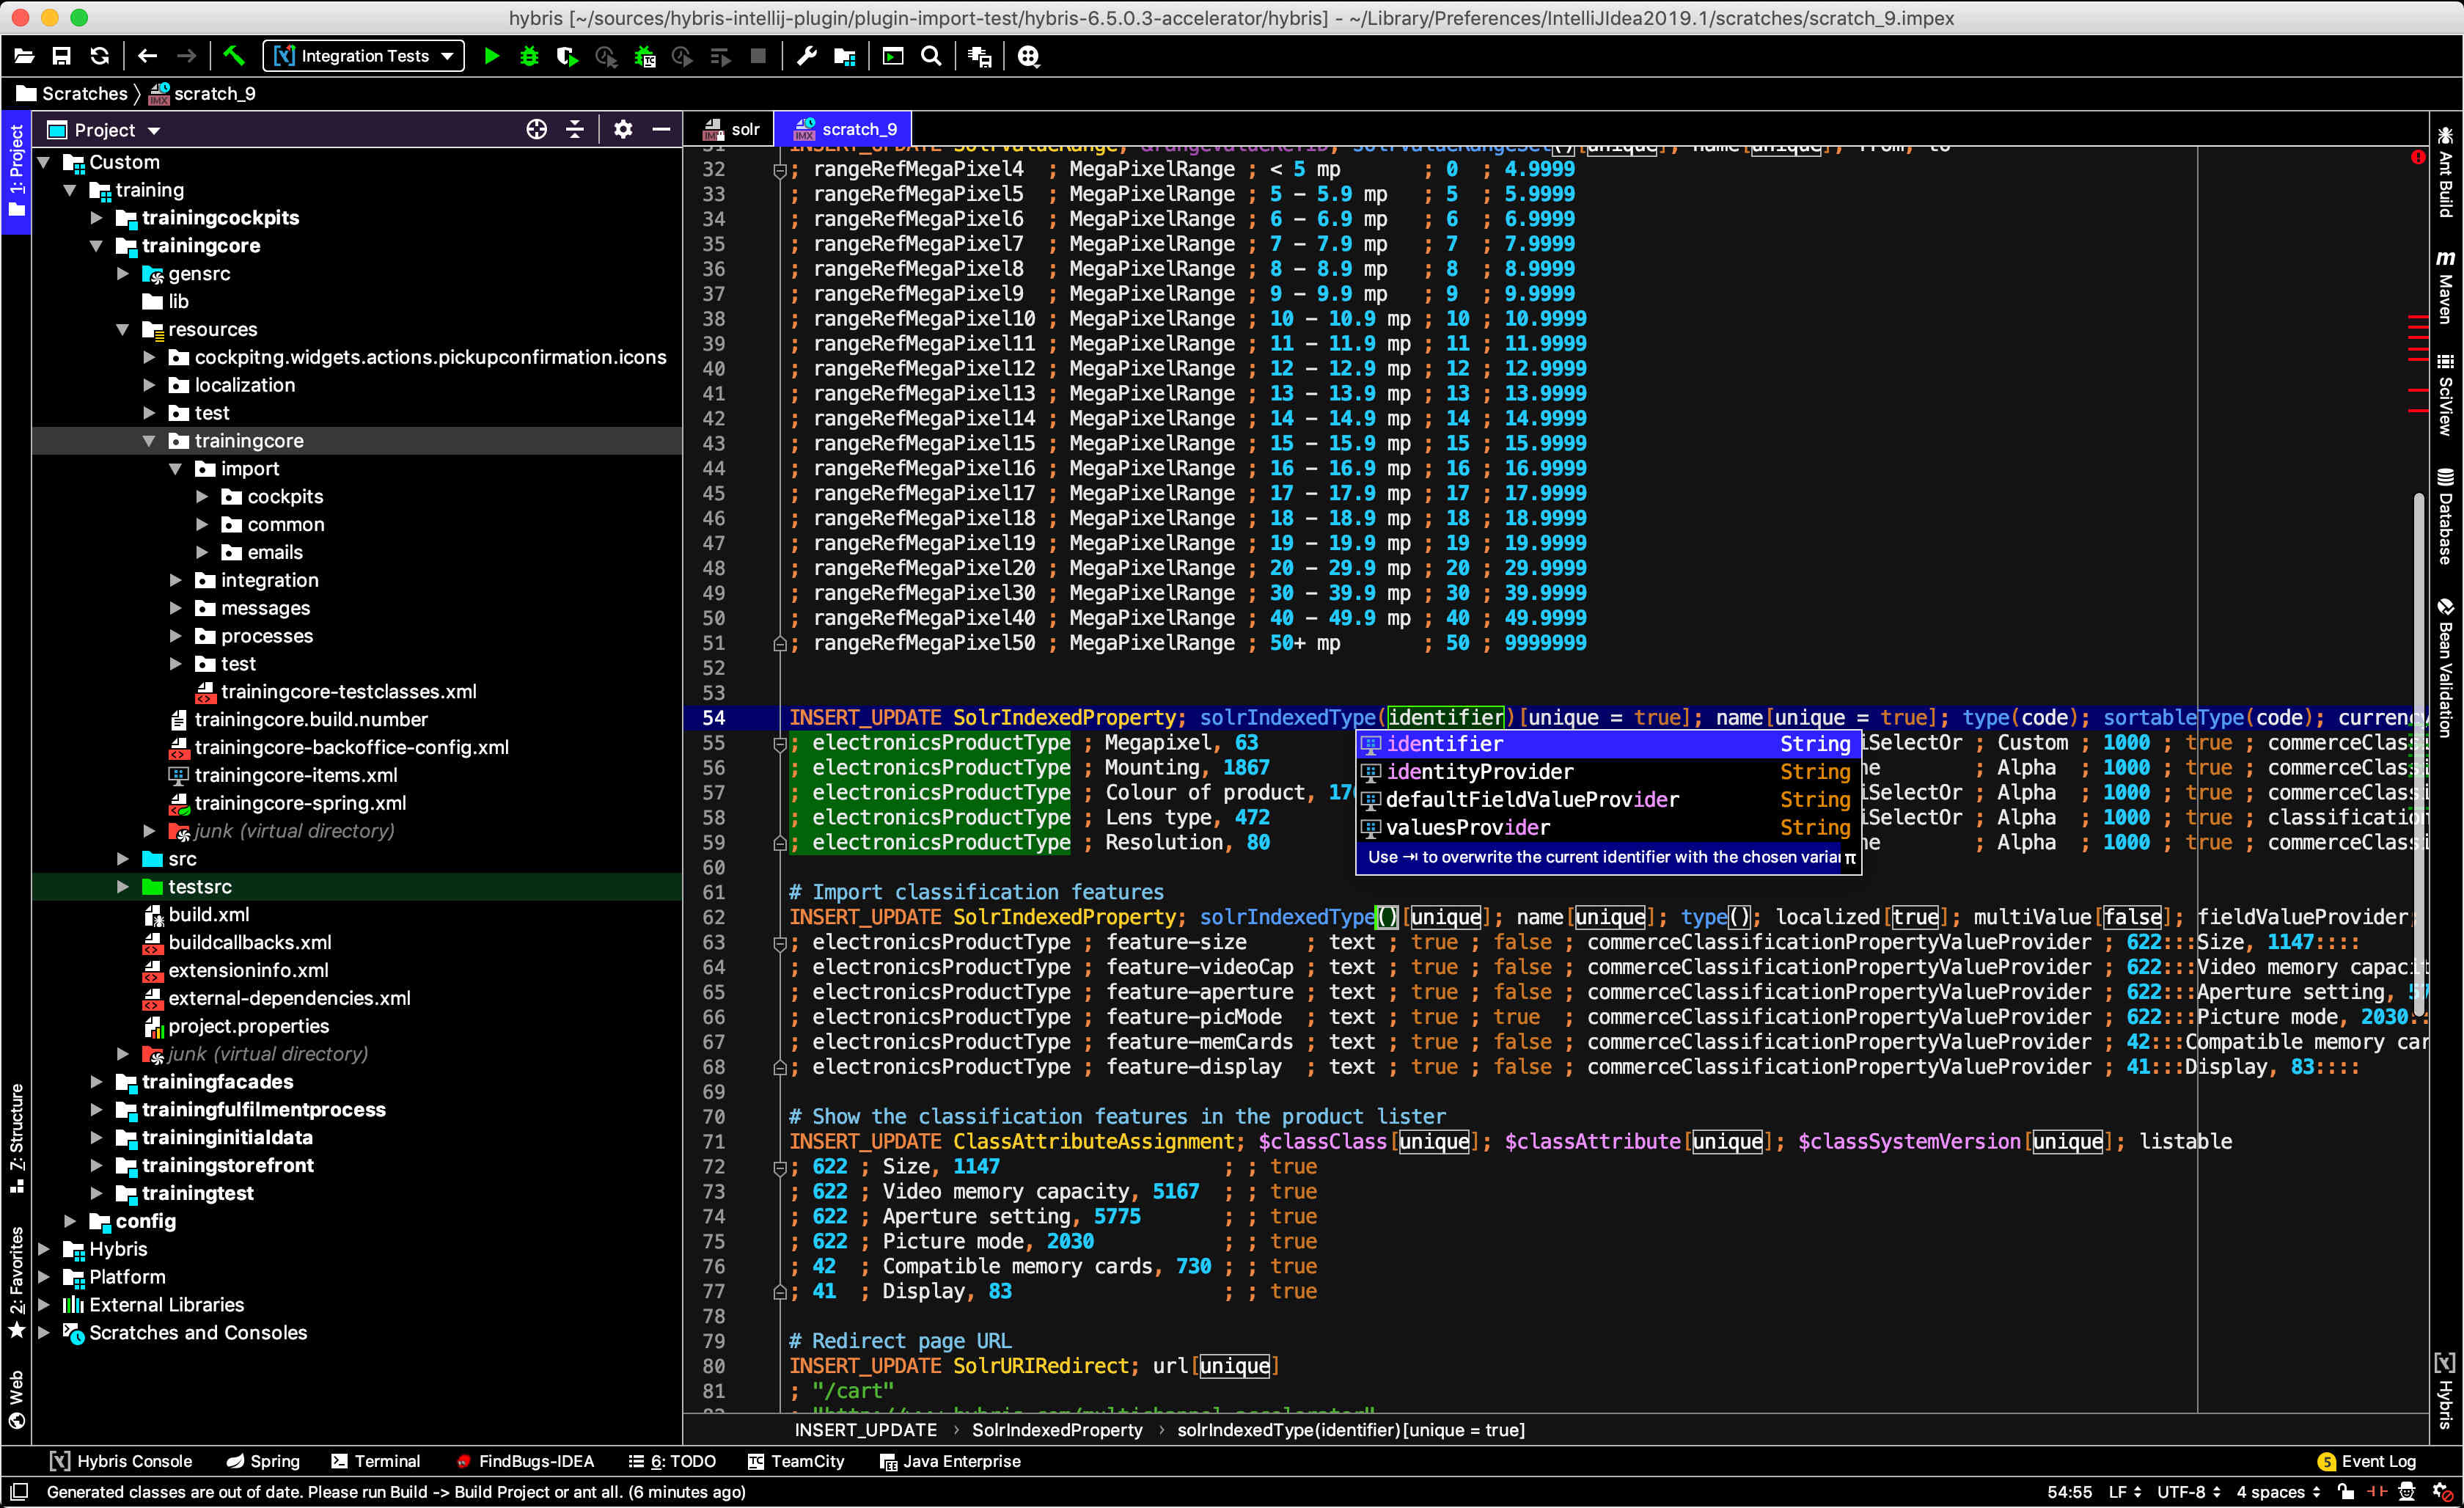 hybris integration - Plugins | JetBrains